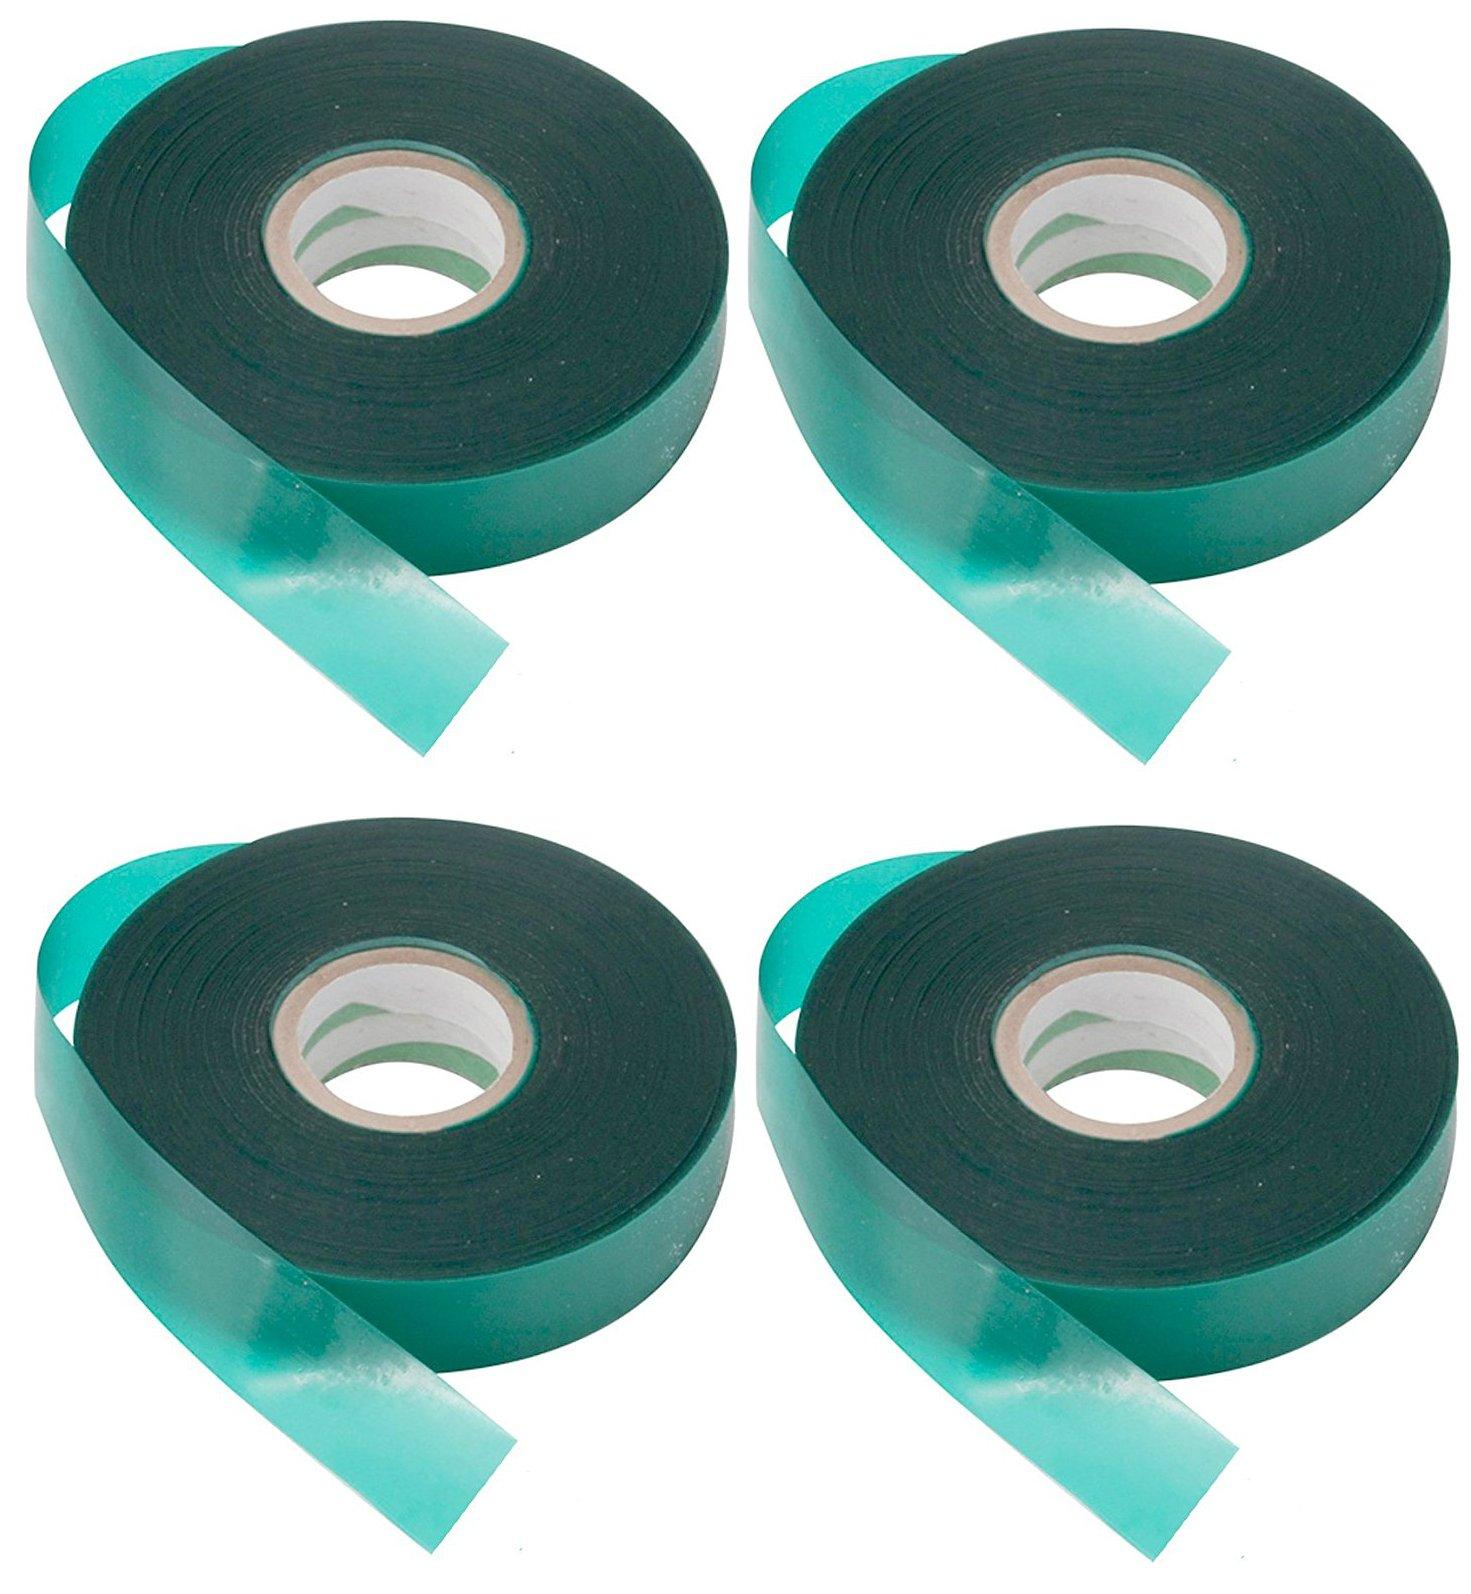 4 Rolls - Wide Tie Tape 150 FT x 1'' Heavy Duty 8 MIL, Stretch Plant Ribbon Garden Green Vinyl Stake